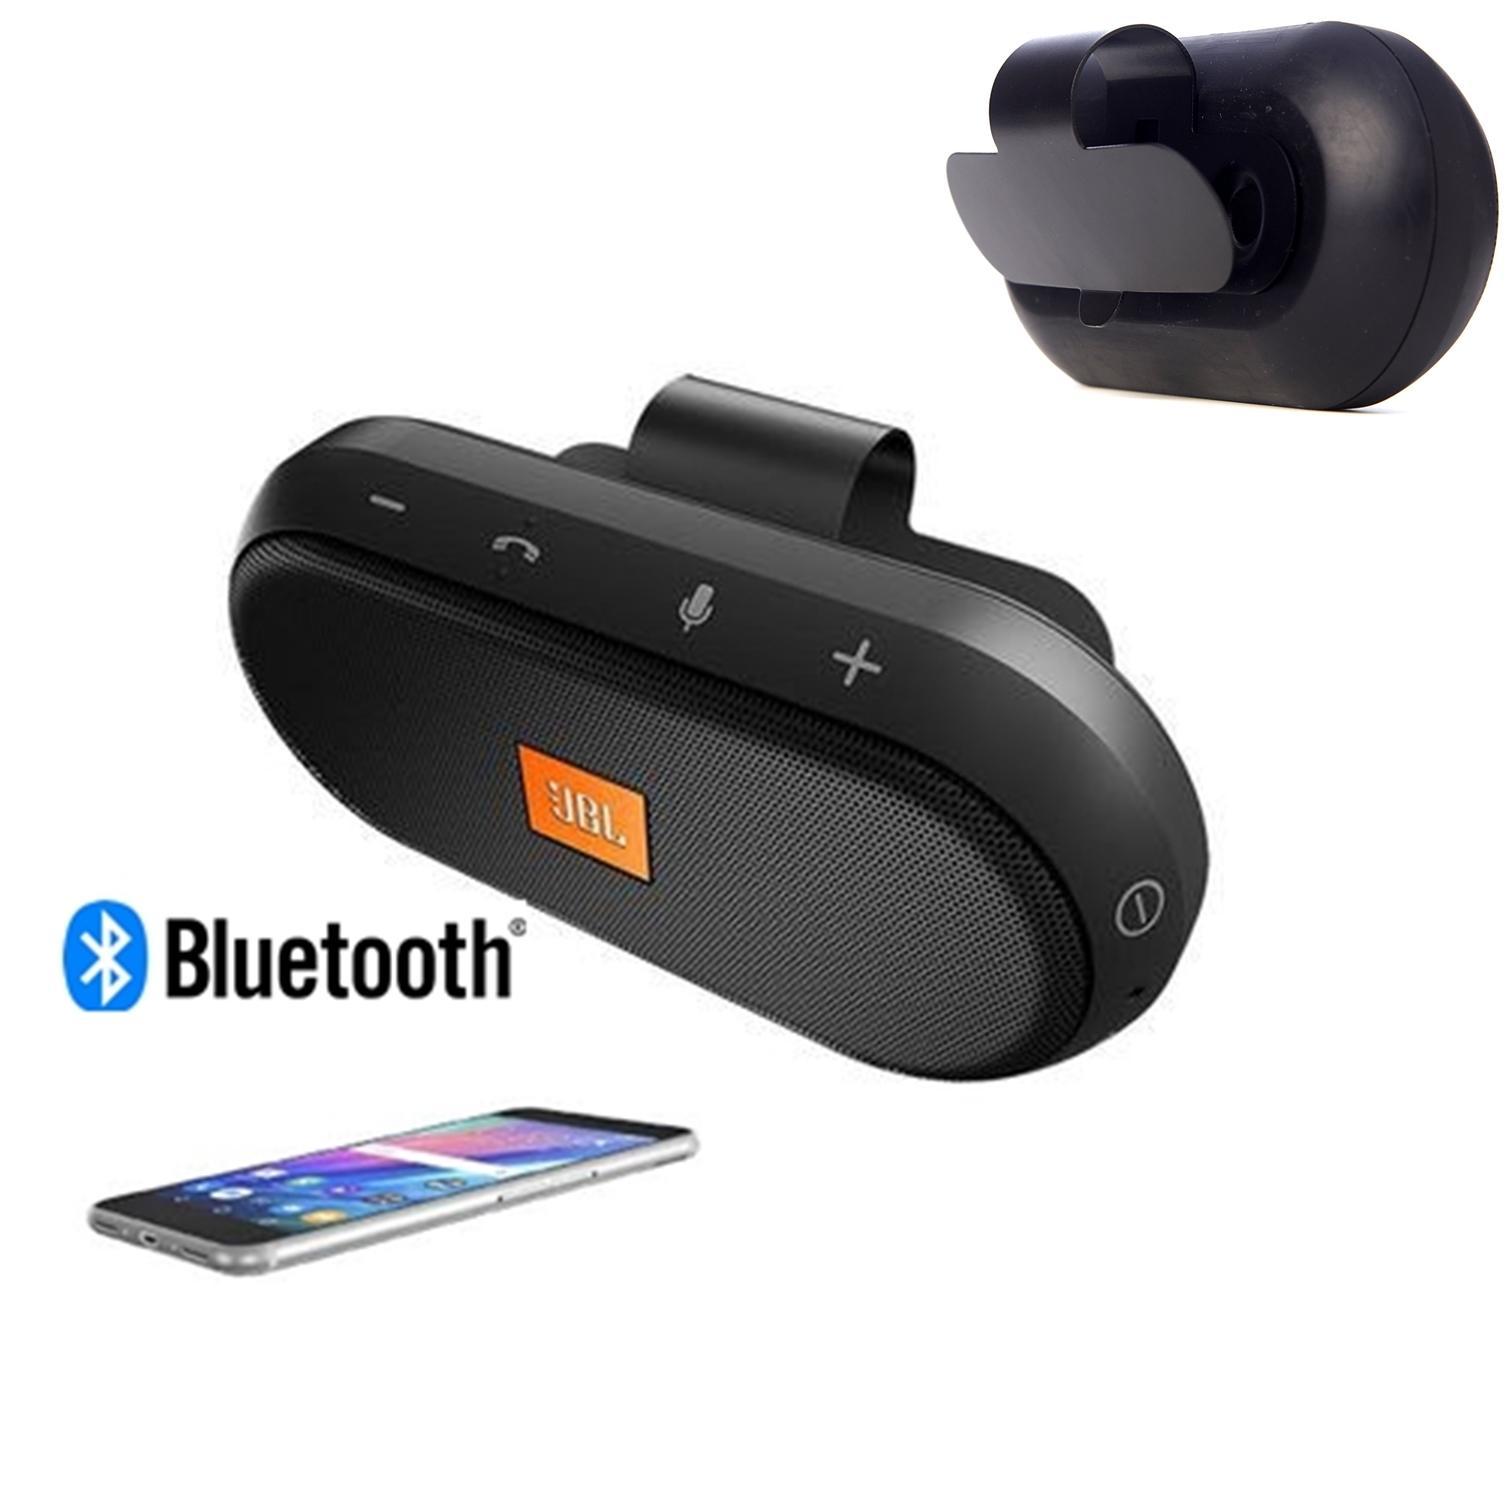 Cek Harga Baru Jbl Trip Wireless Portable Speaker Bluetooth Terkini Flip 2 Merah Visor Mount By Harman